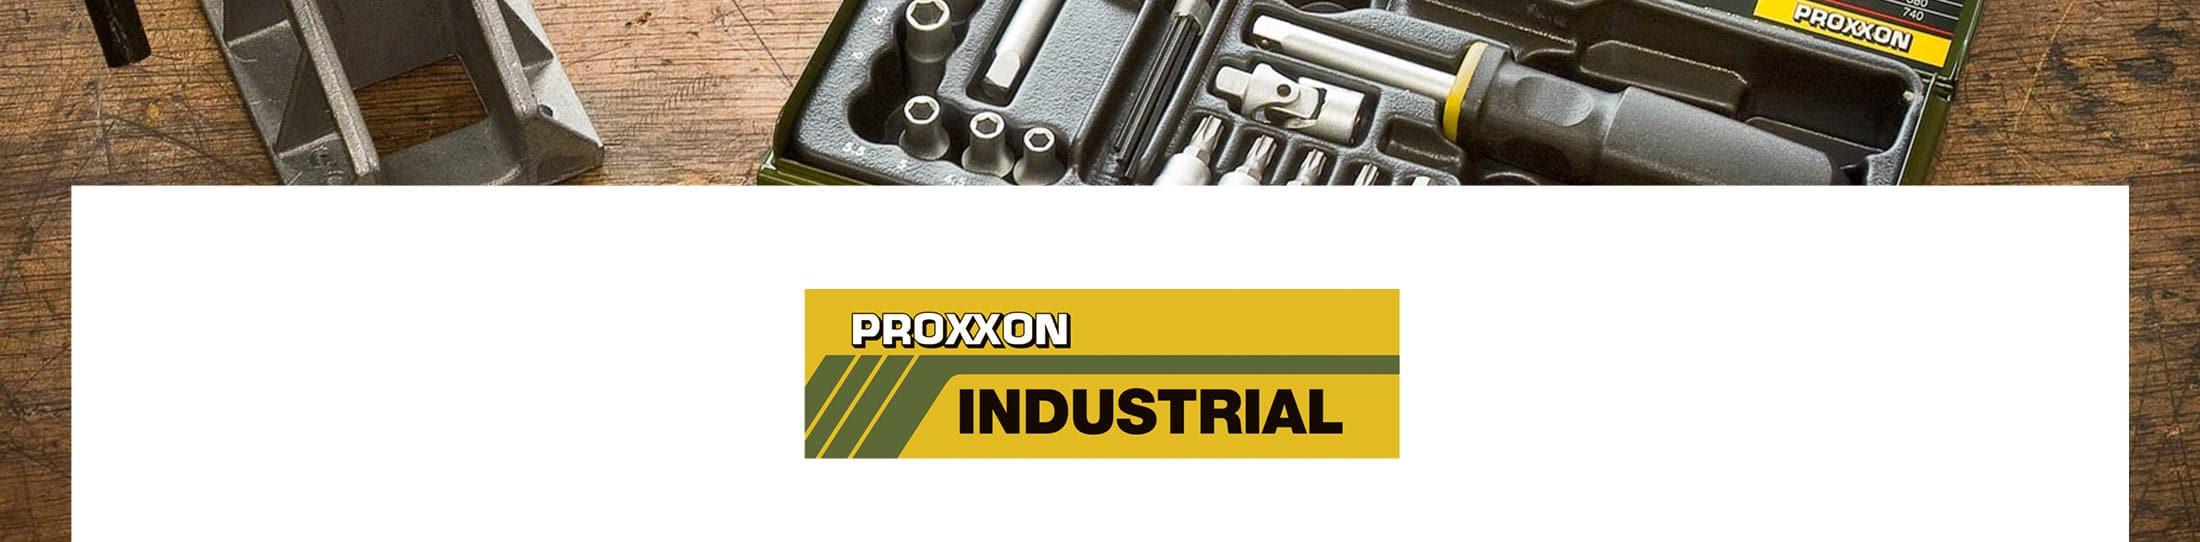 Proxxon Industrial